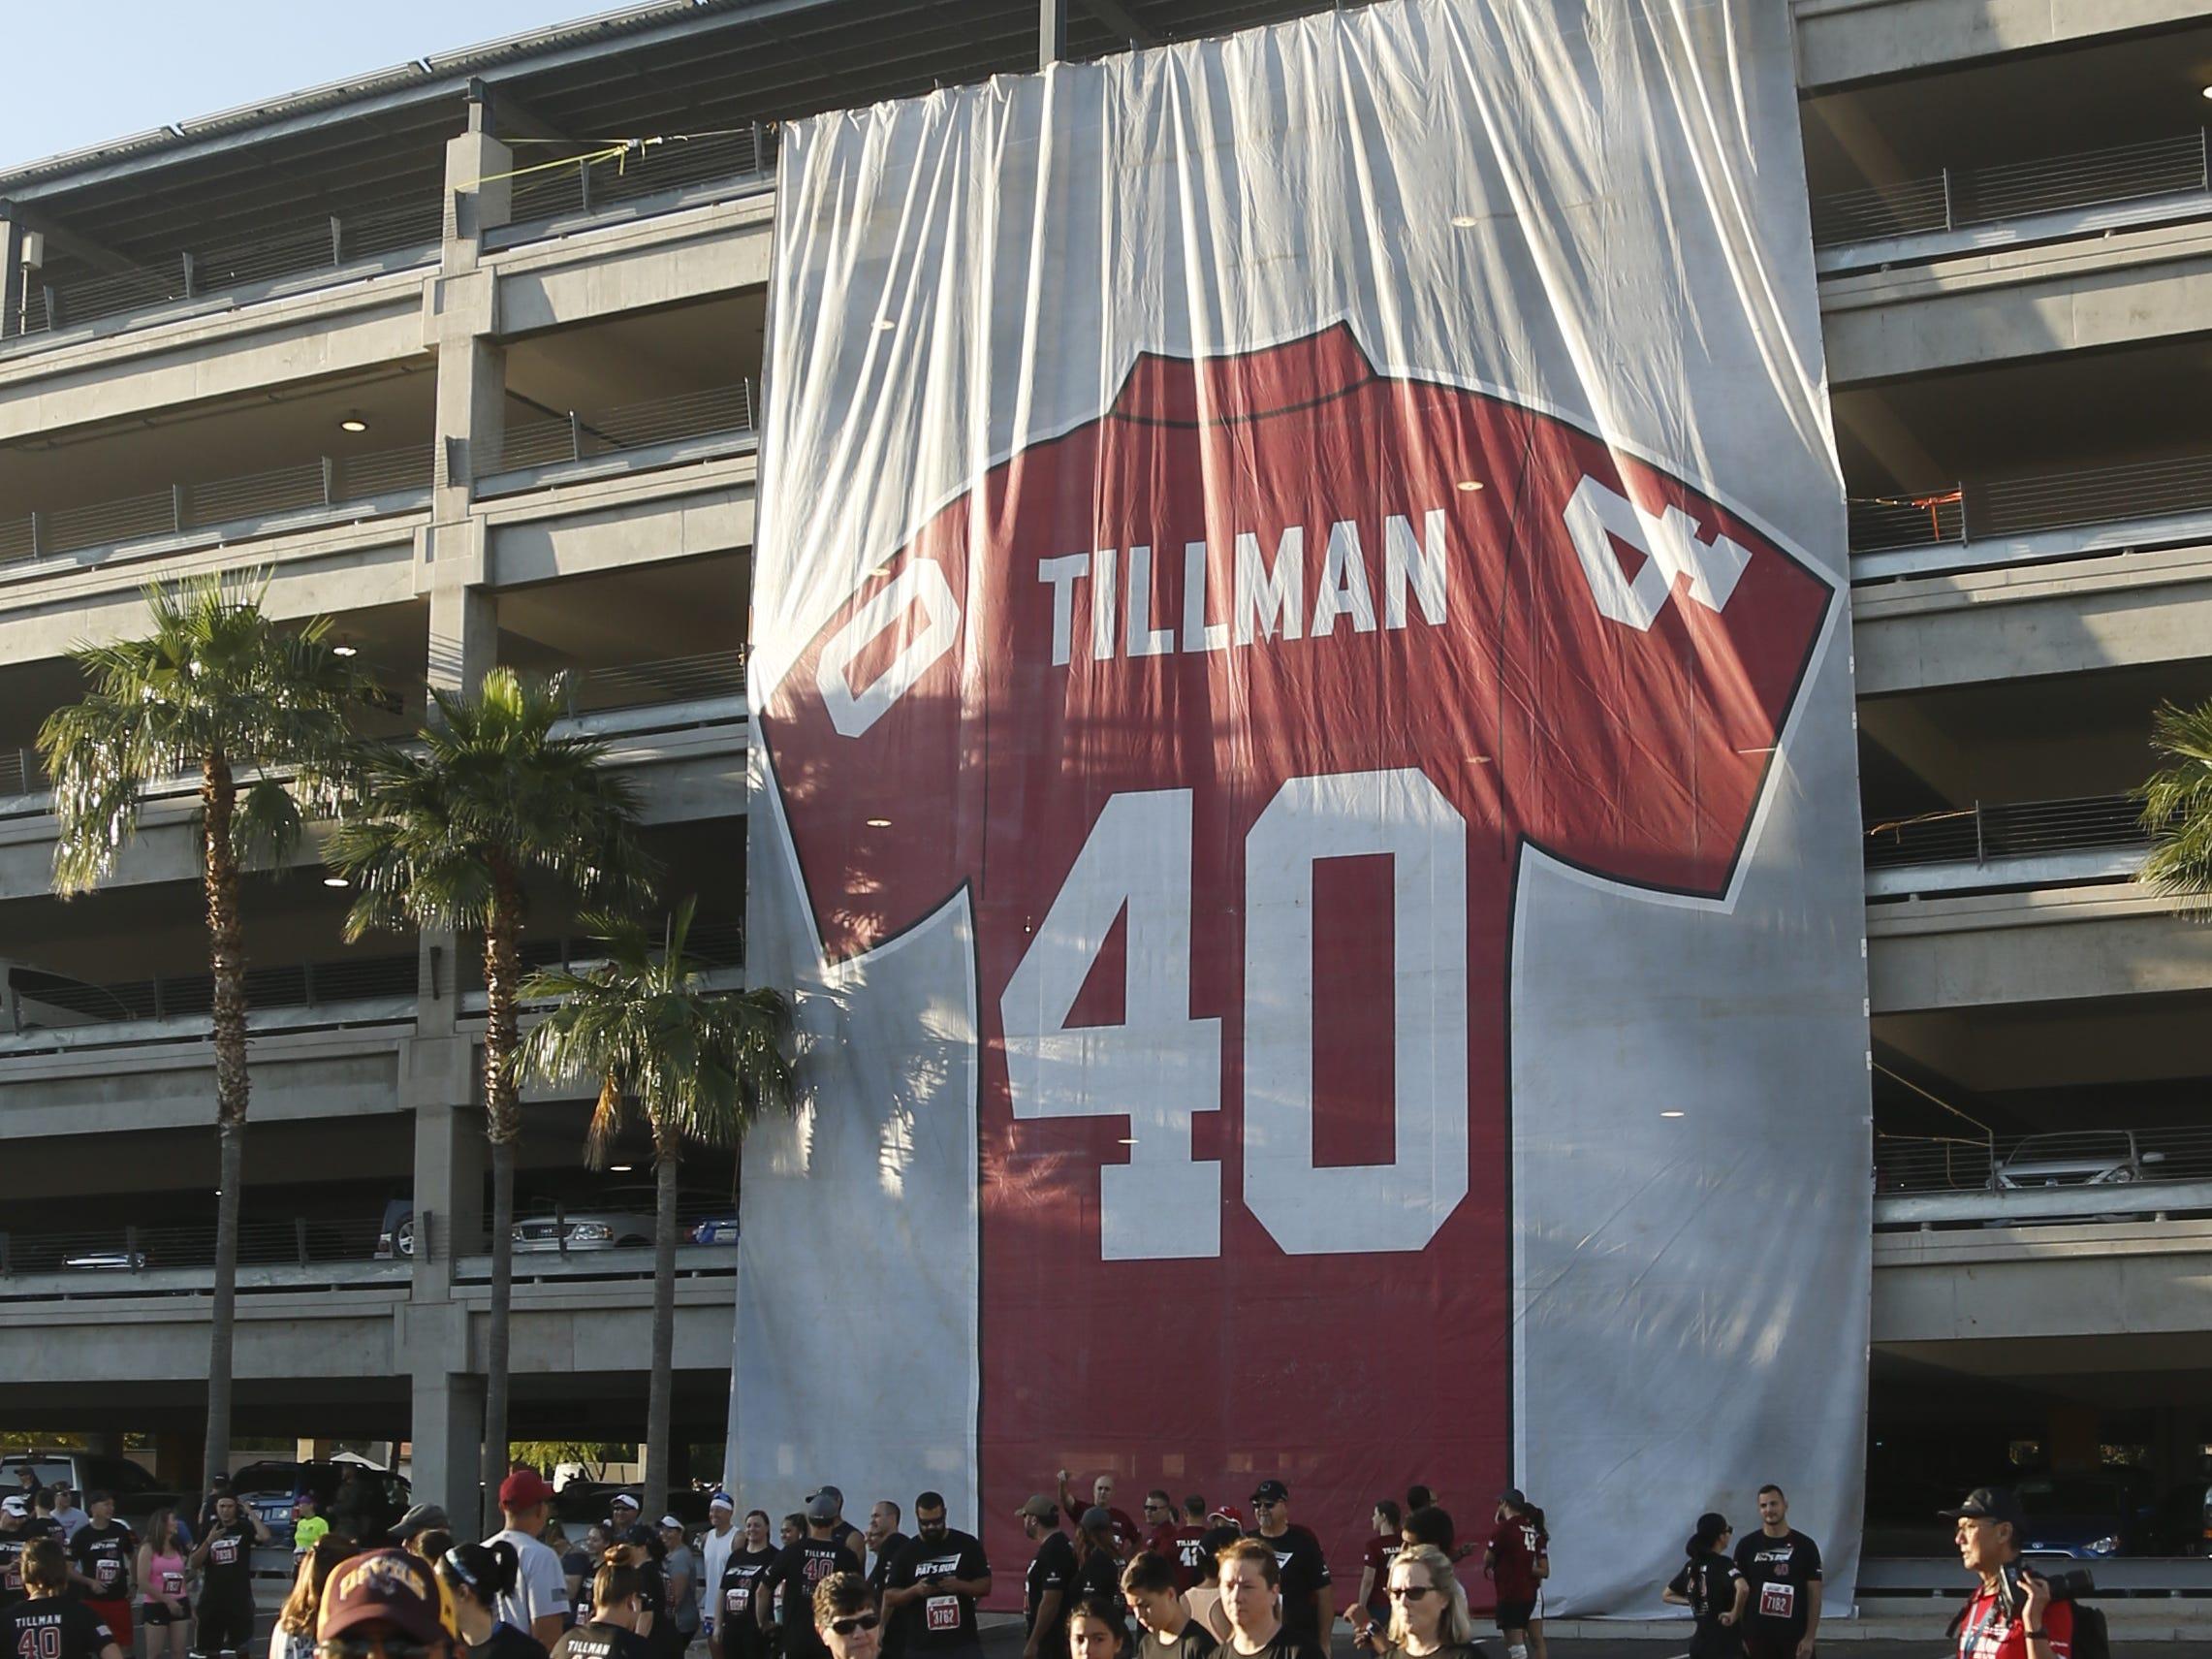 A Pat Tillman jersey banner hangs off the parking garage during Pat's Run 2019 in Tempe, Ariz. on April 27, 2019.